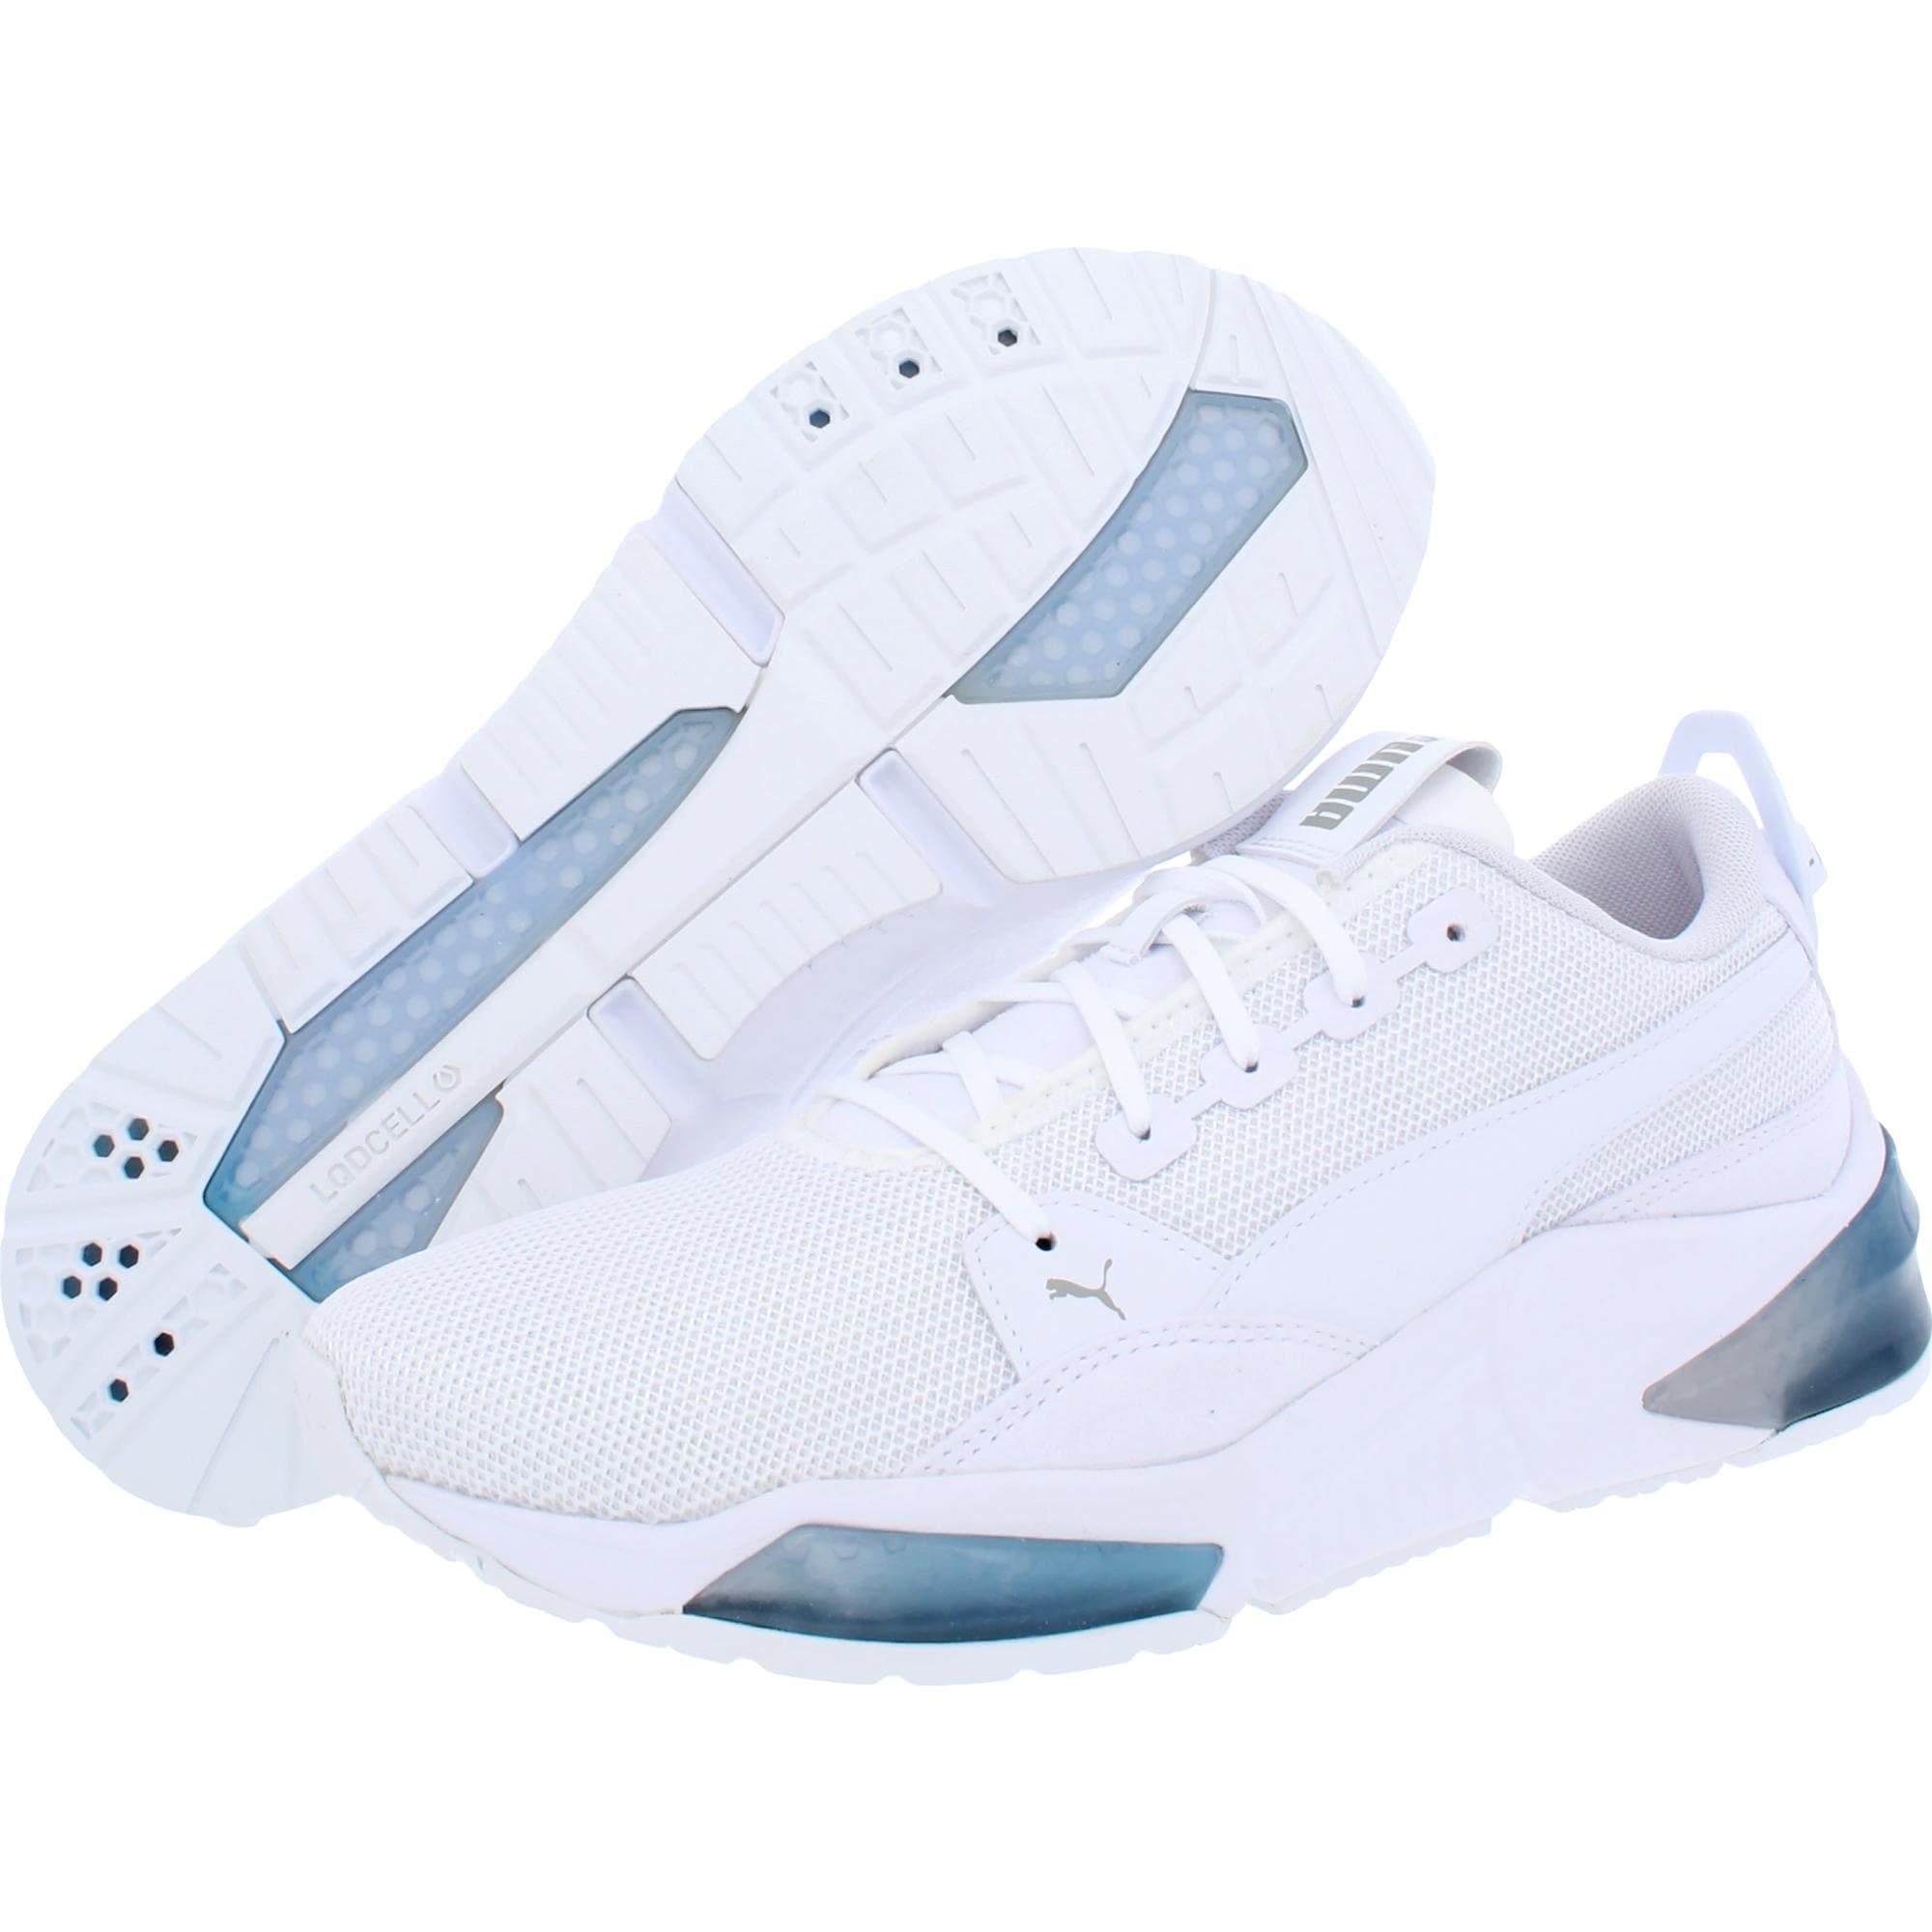 Puma Mens LQDCell Optic Dim Running Shoes Mesh Fitness - Puma White/Palace Blue